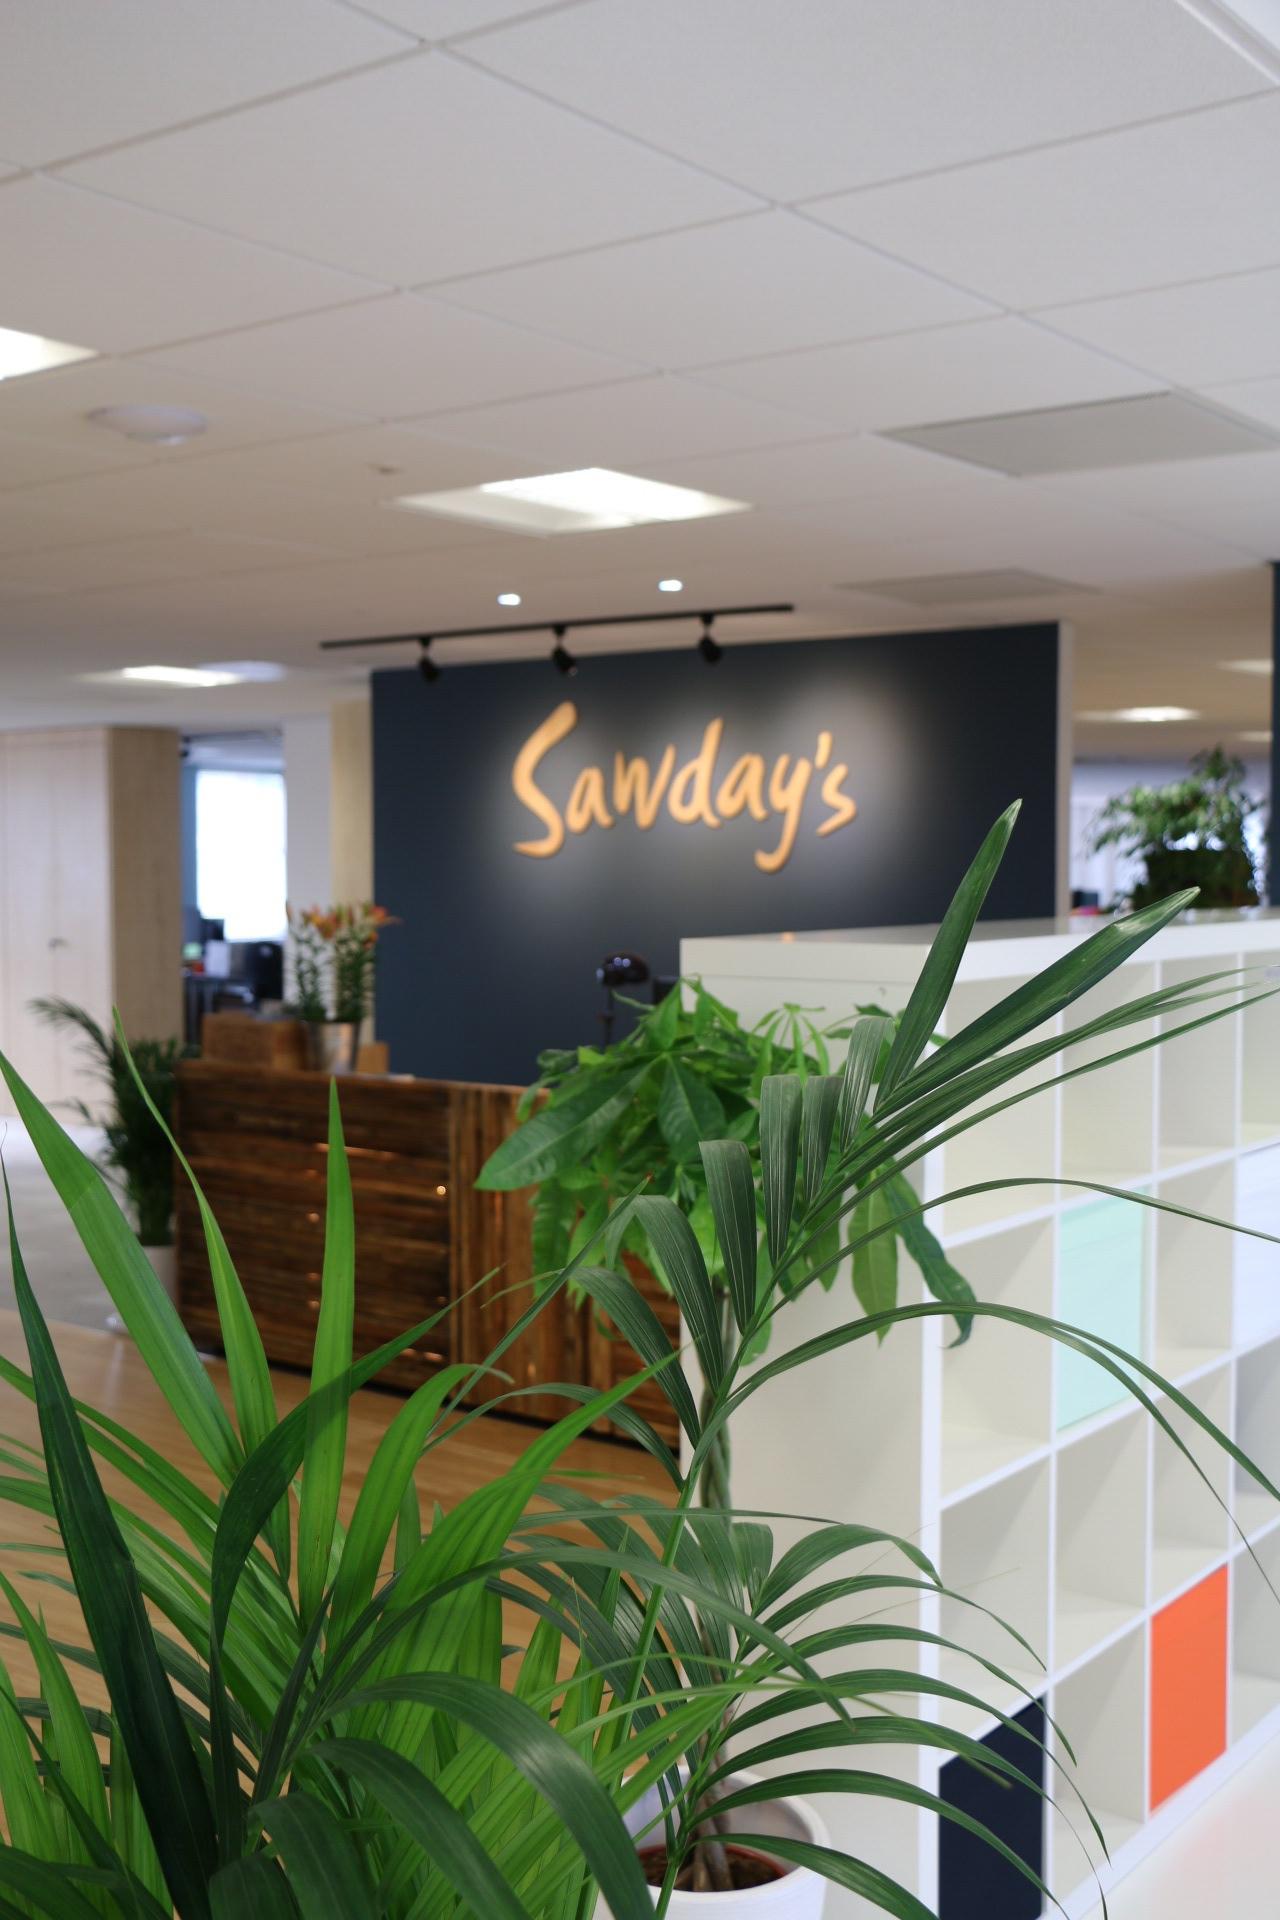 Sawdays reception area